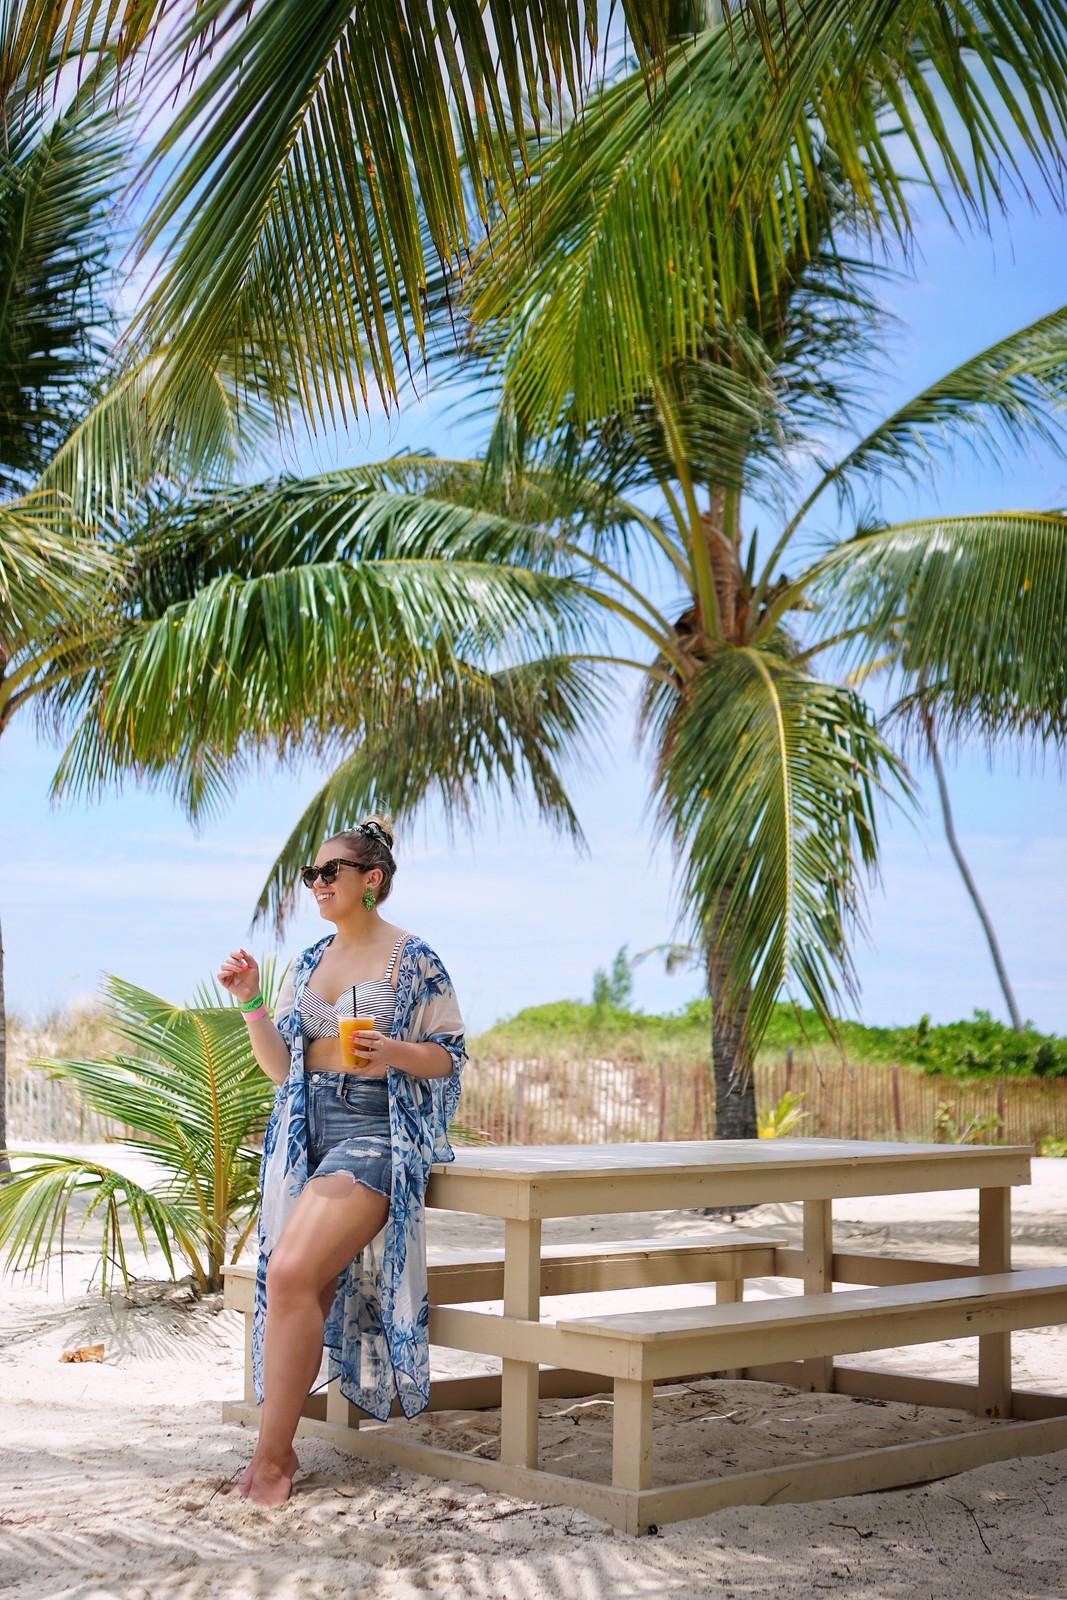 Bahamas Blue Lagoon Island Private Island H&M Kimono and Striped Bathing Suit